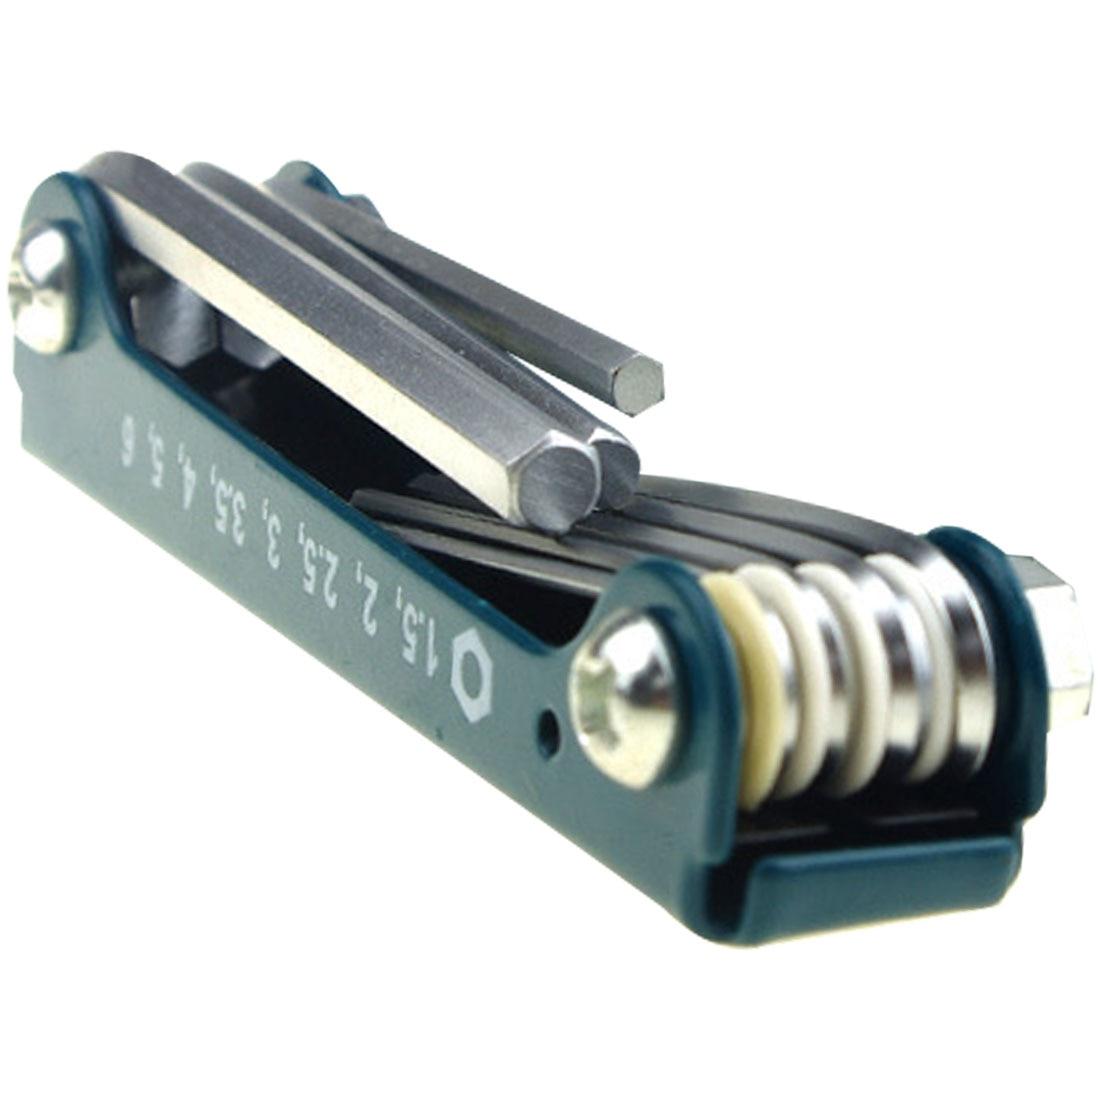 Class M Case of 10 0.219 Thick Coated 0.551 Inscribed Circle Mitsubishi JDMT140523ZDER-JL MP9130 Carbide Milling Insert 0.091 Corner Radius Grade MP9130 Round Honing